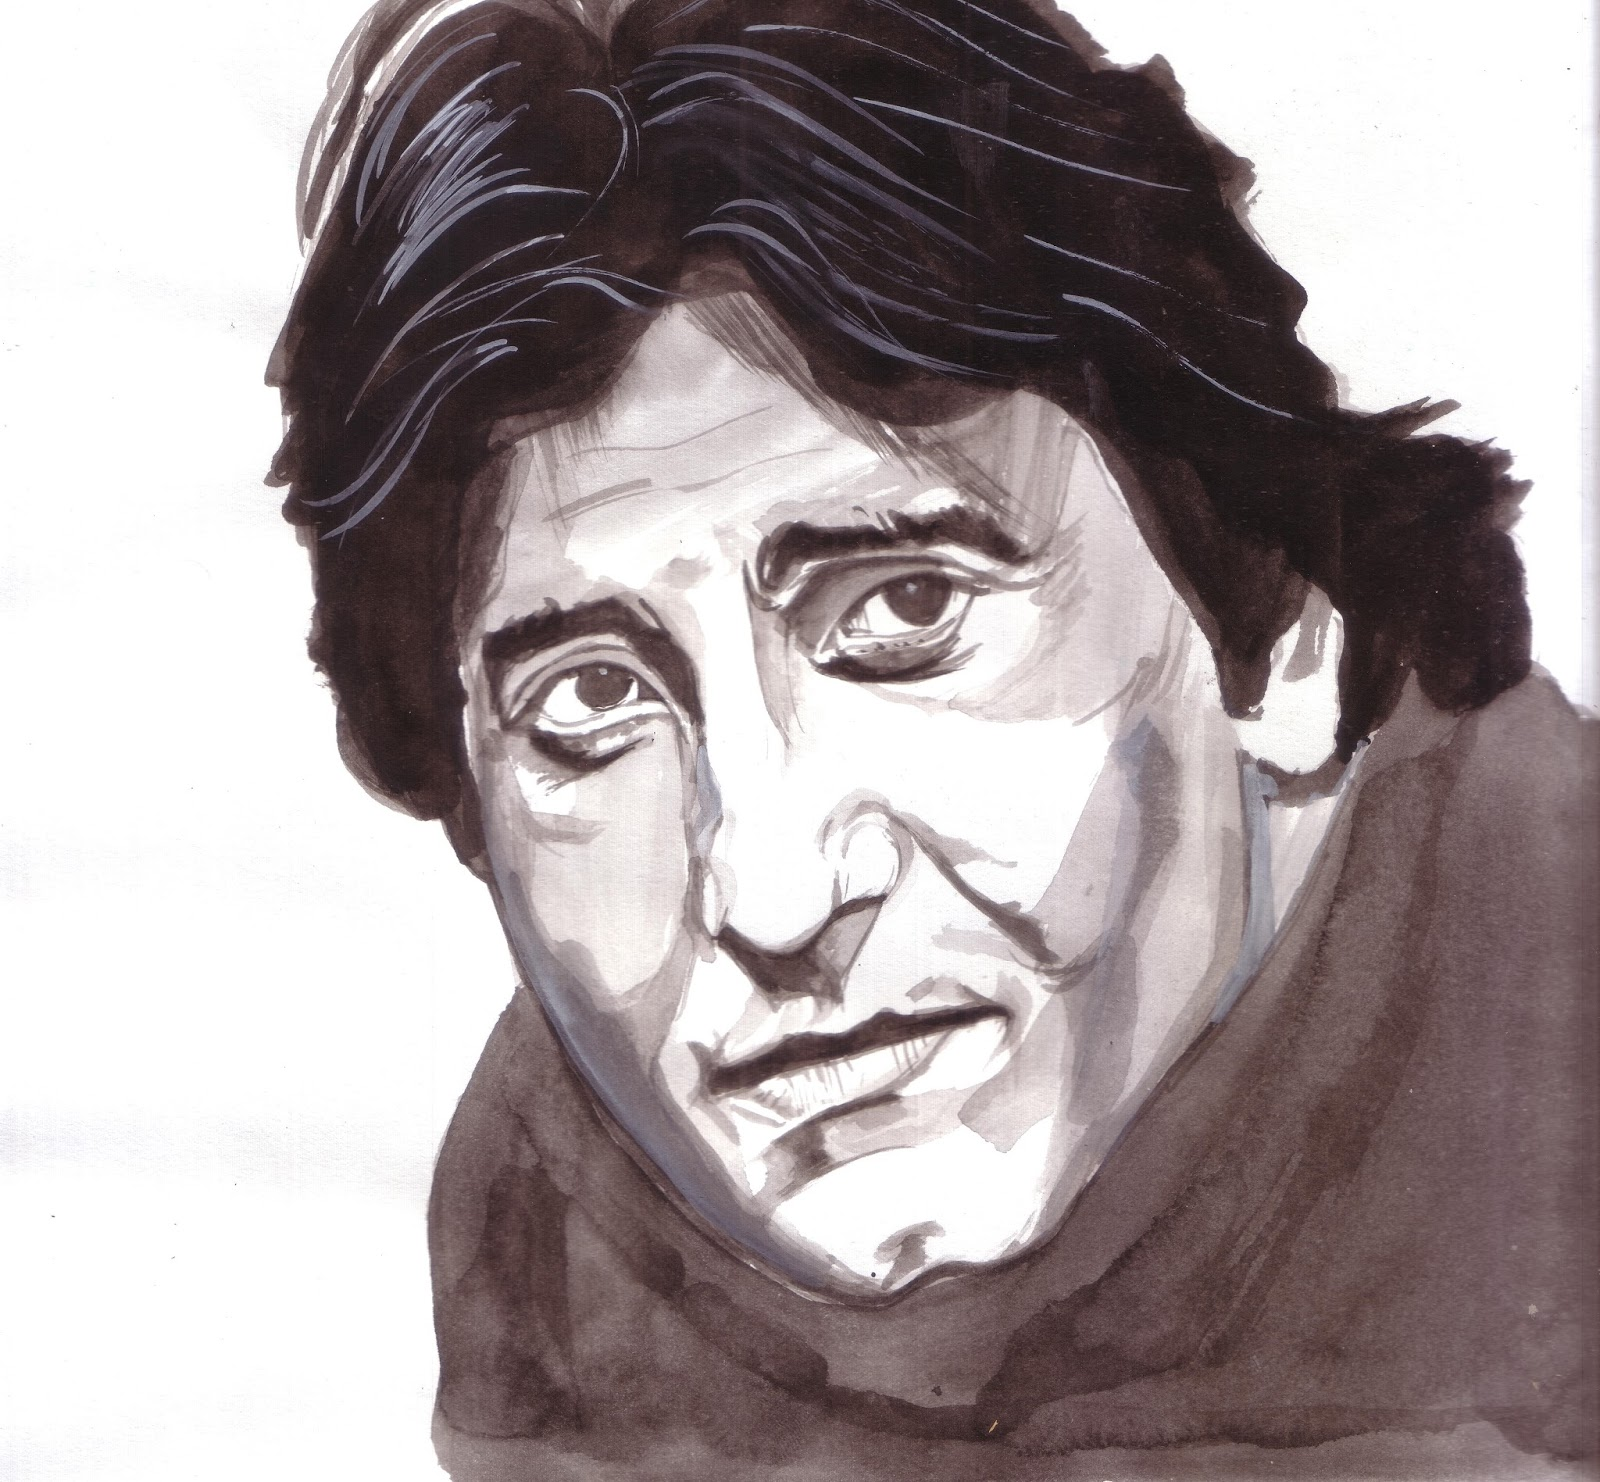 image-Vinod-Khanna-Portrait--Saurabh-Turakhias-passion-for-celebrity-portraits-mediabrief